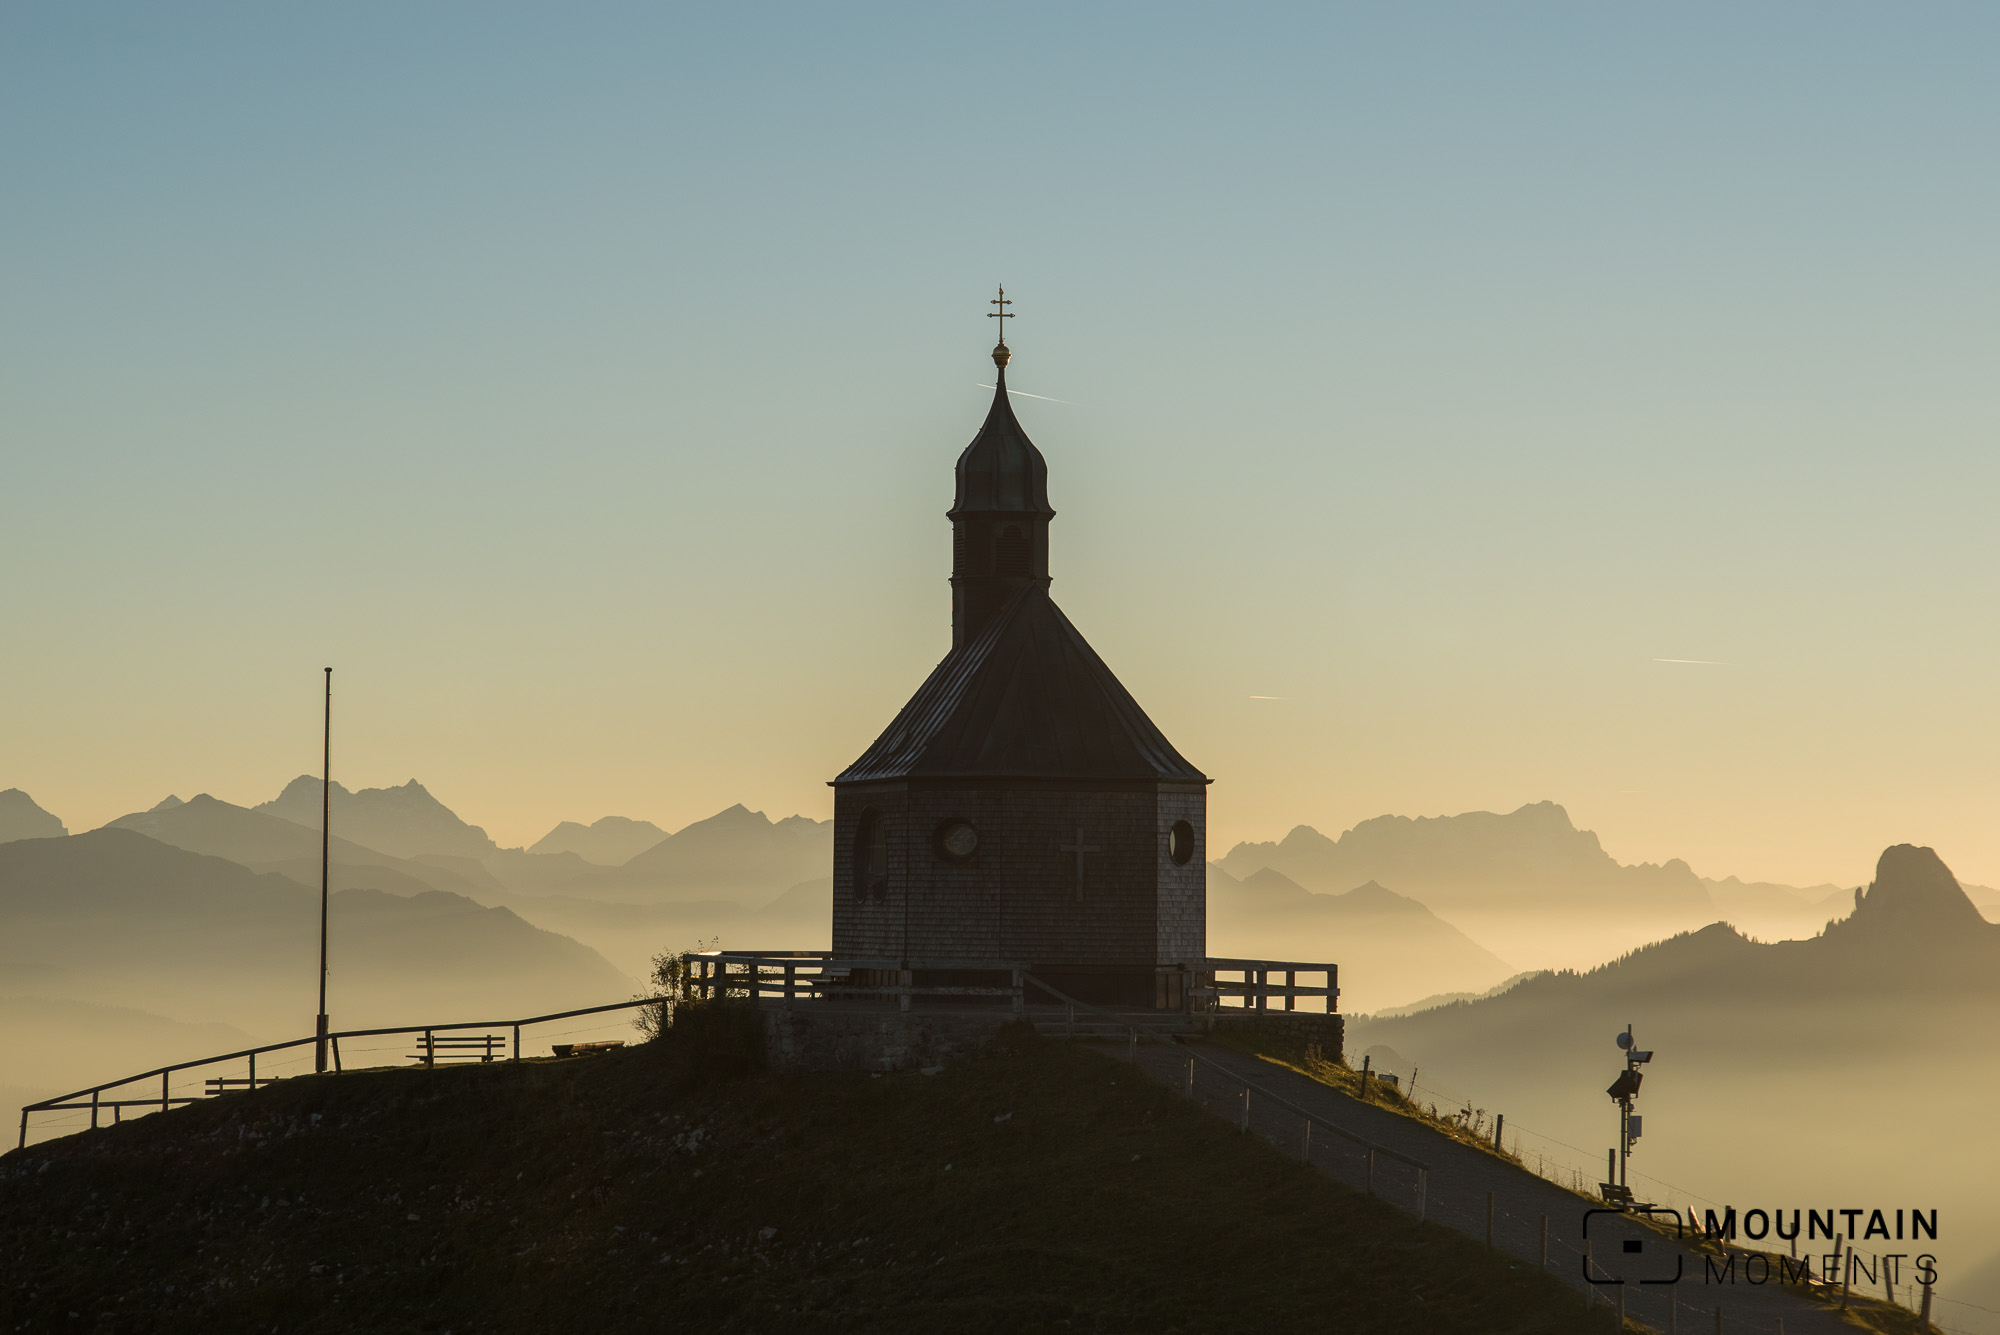 wallberg, fotospot bayern, fotospot bayerische alpen